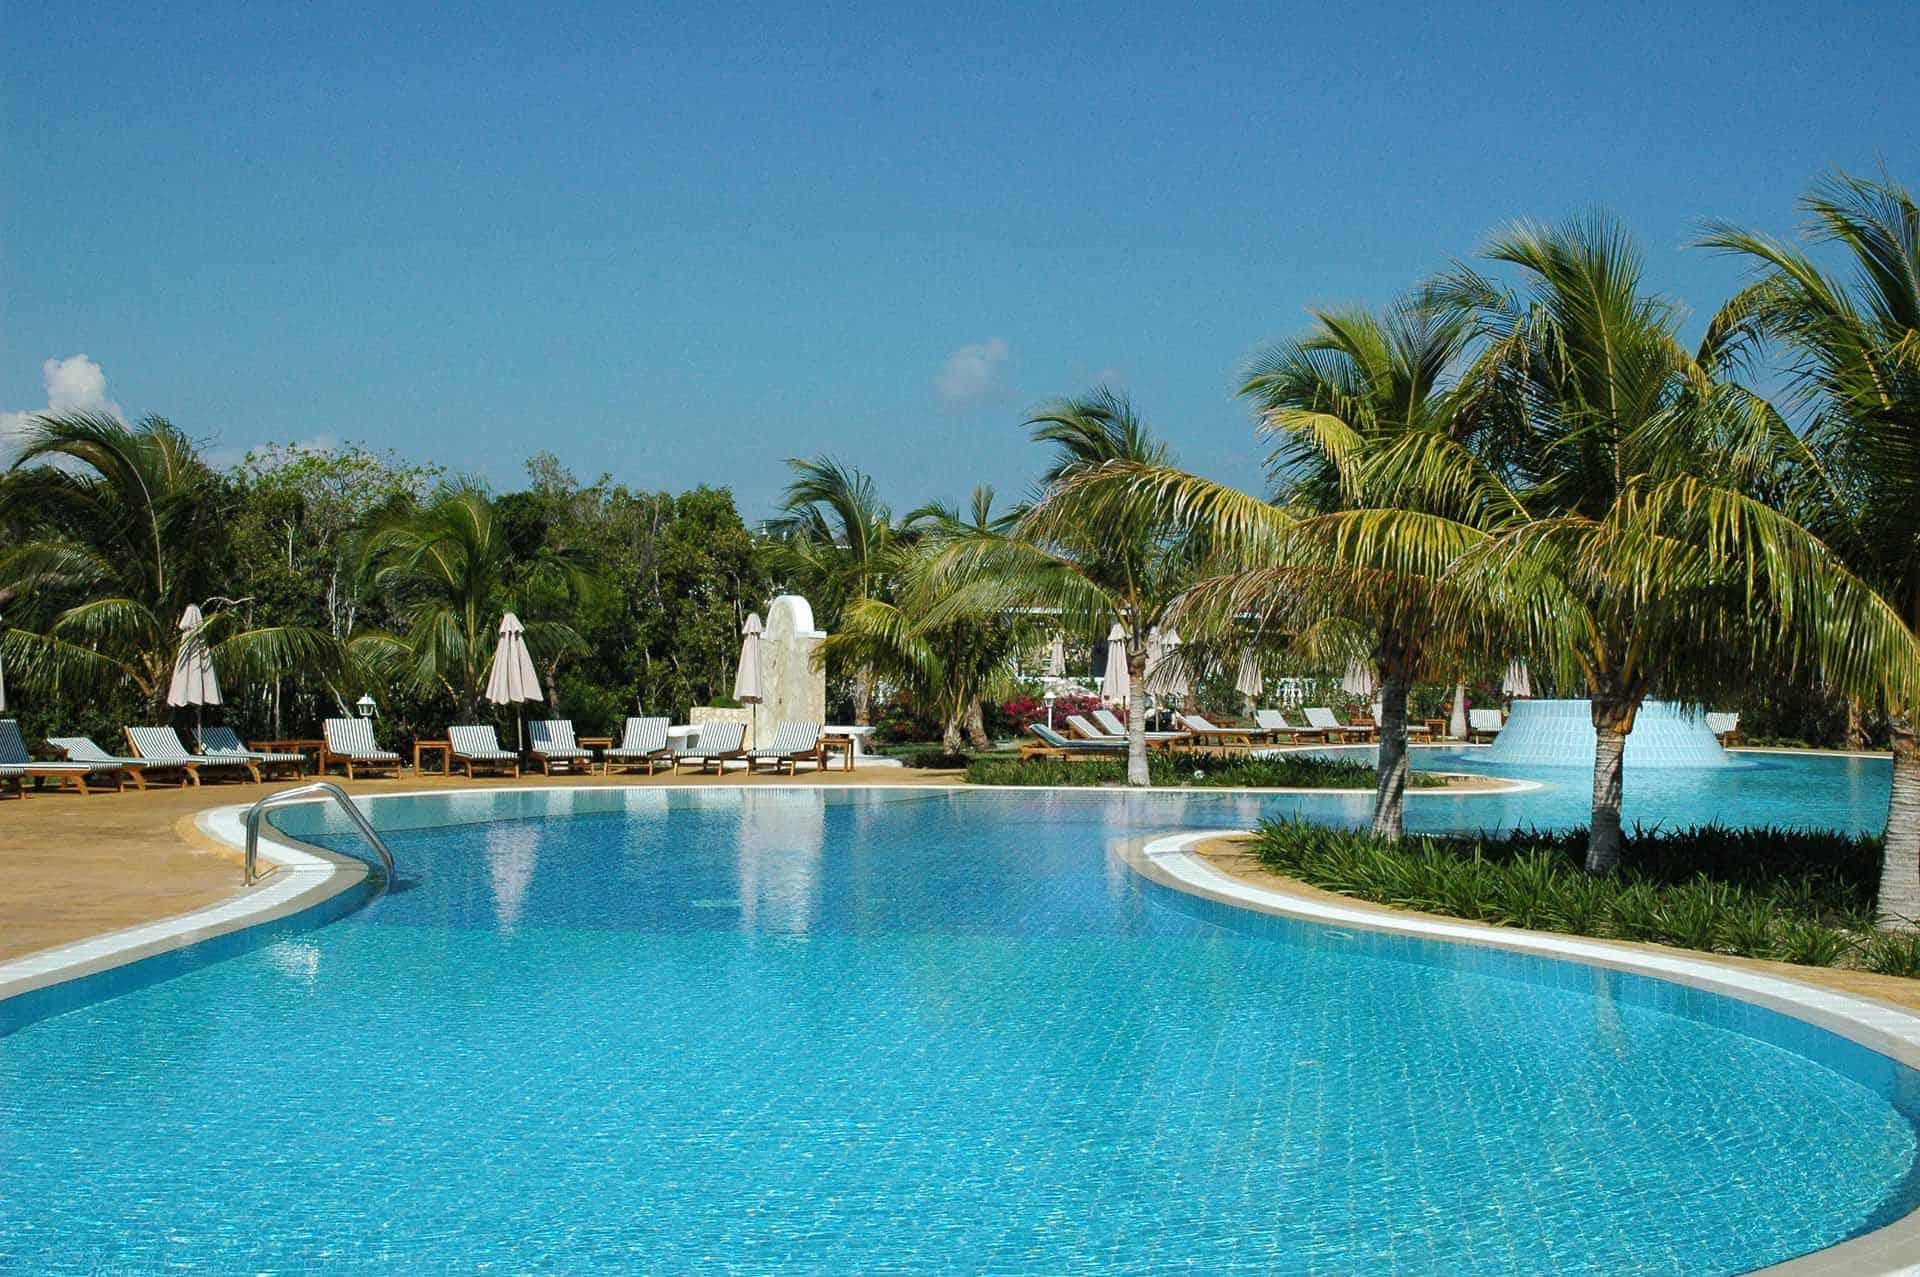 cayo santa maria hotel piscine palmiers cuba autrement 4